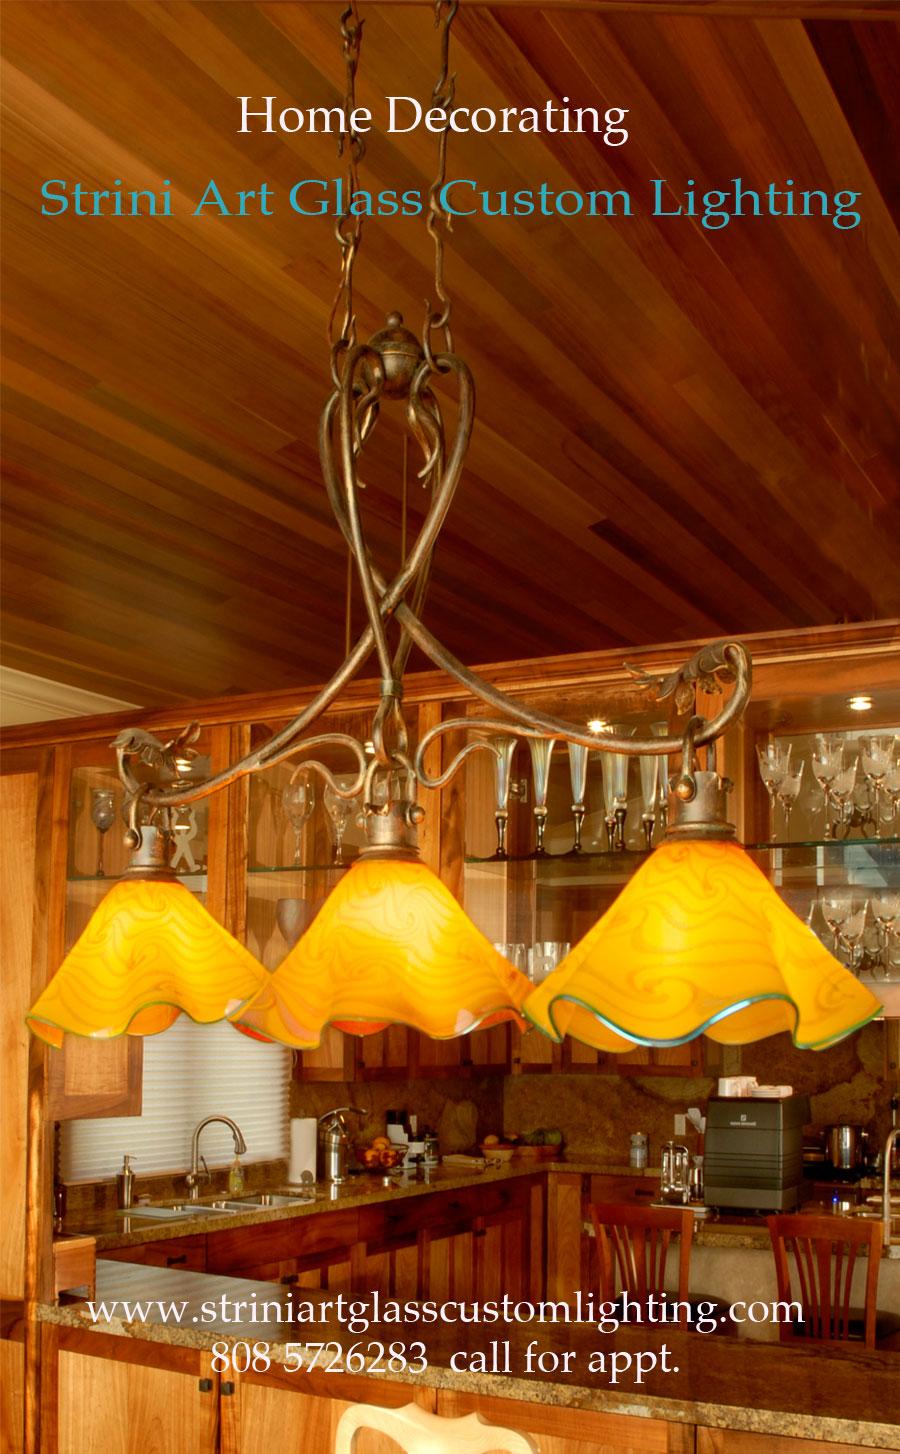 Three Light Trestle Lamp Kitchen, Strini Art Glass 2015